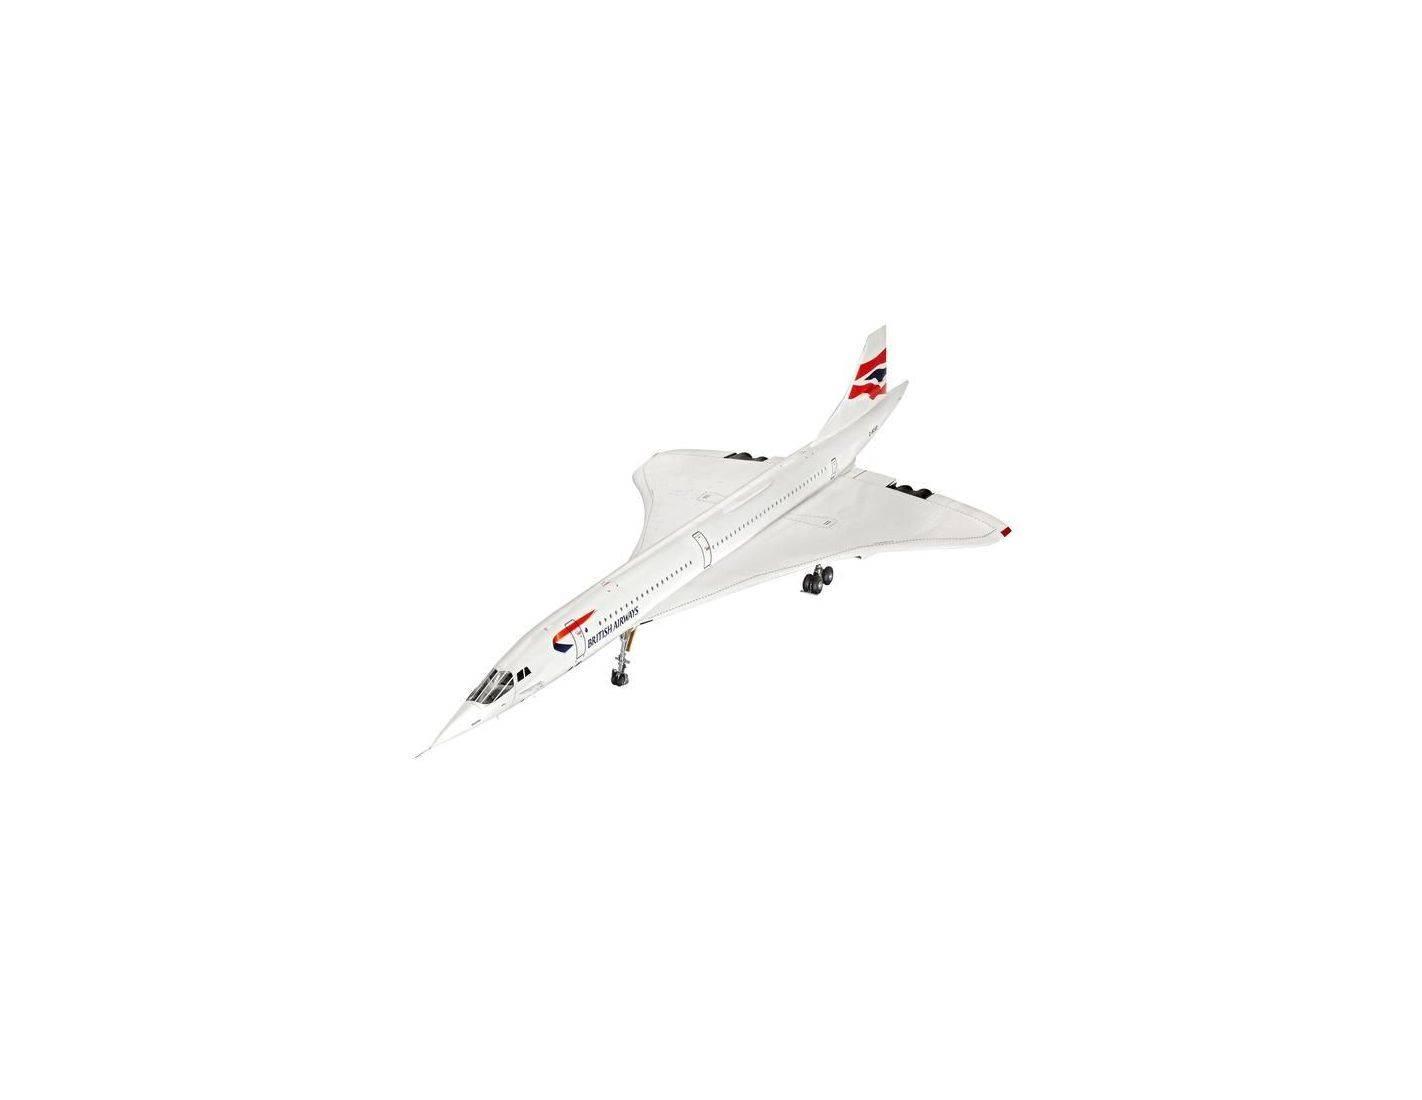 Revell rv4997 concorde british airways kit 1 72 modellino for Modellino concorde